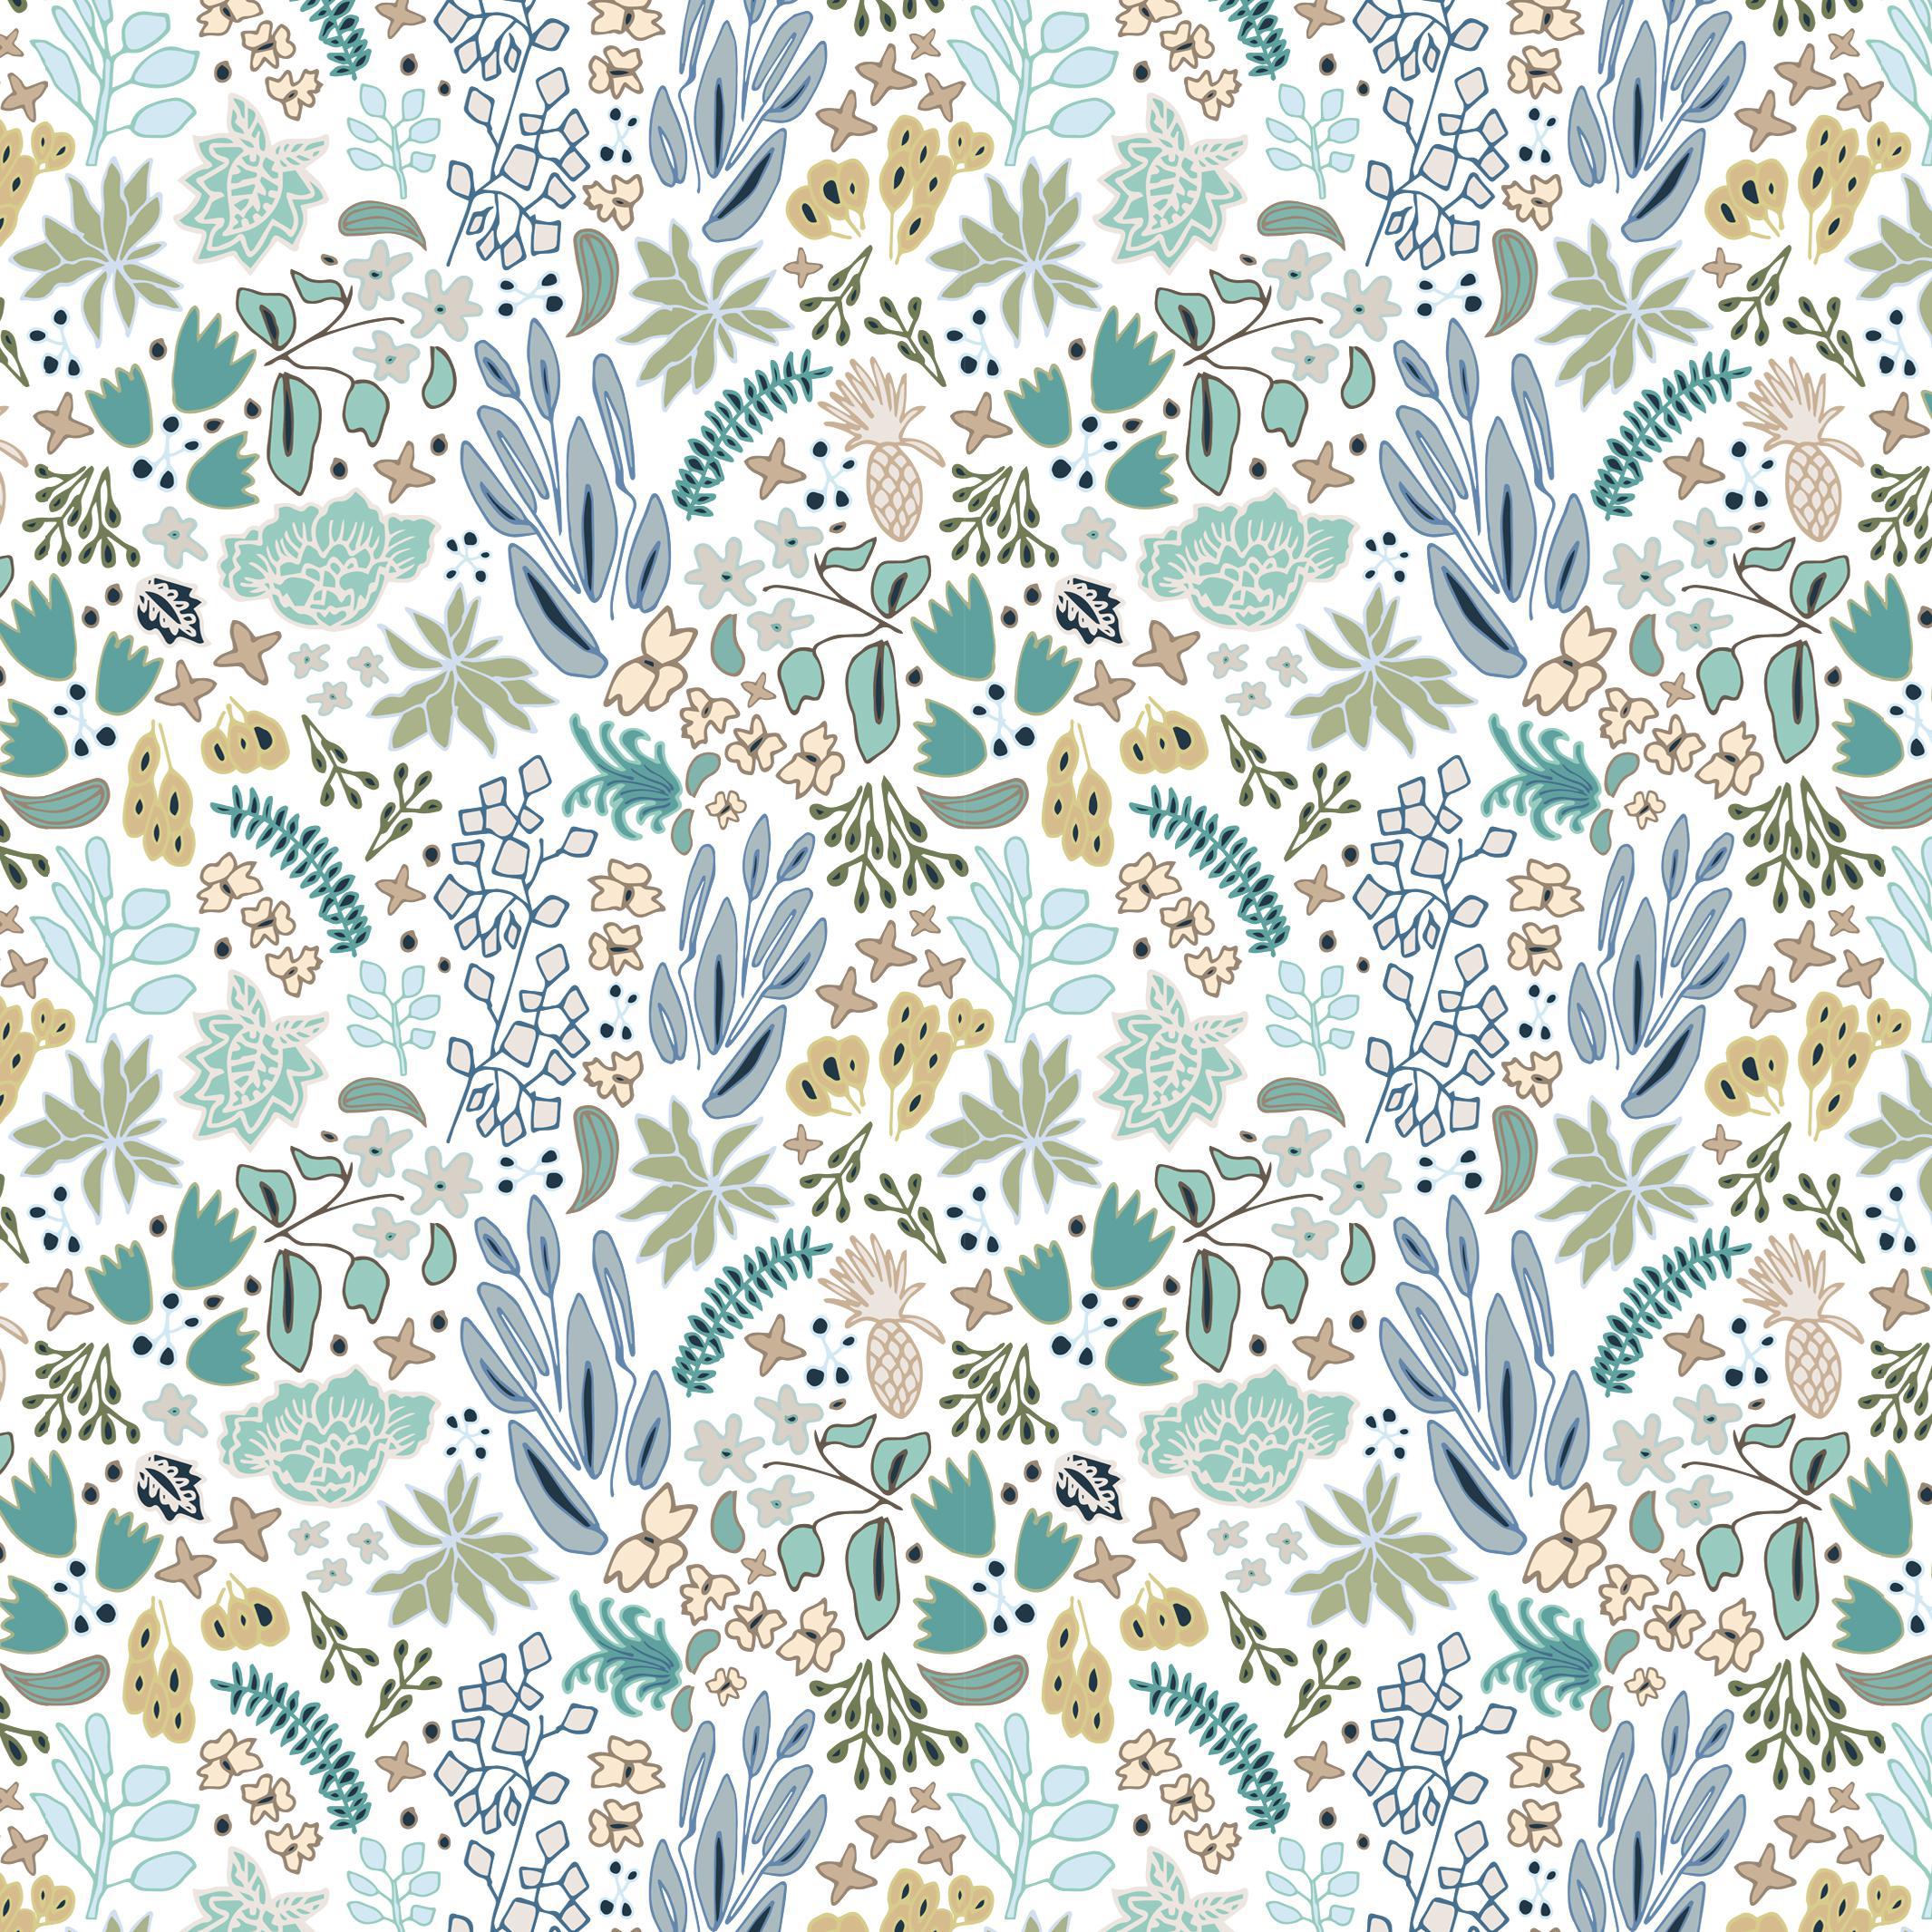 House Of Harris Cambridge Wallpaper 30 Yards Blue Chairish